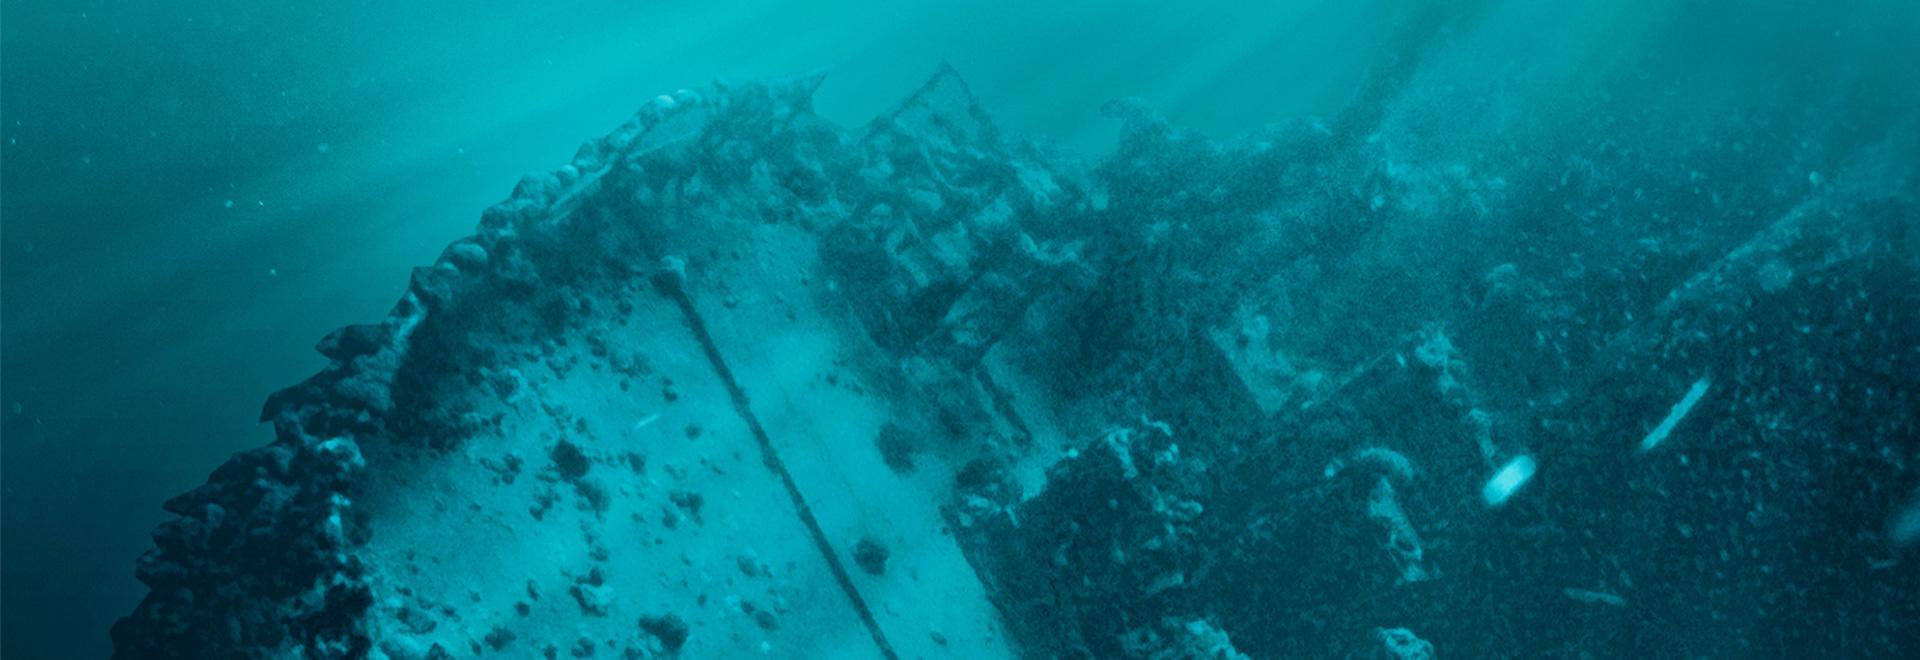 Mega navi: tesori perduti